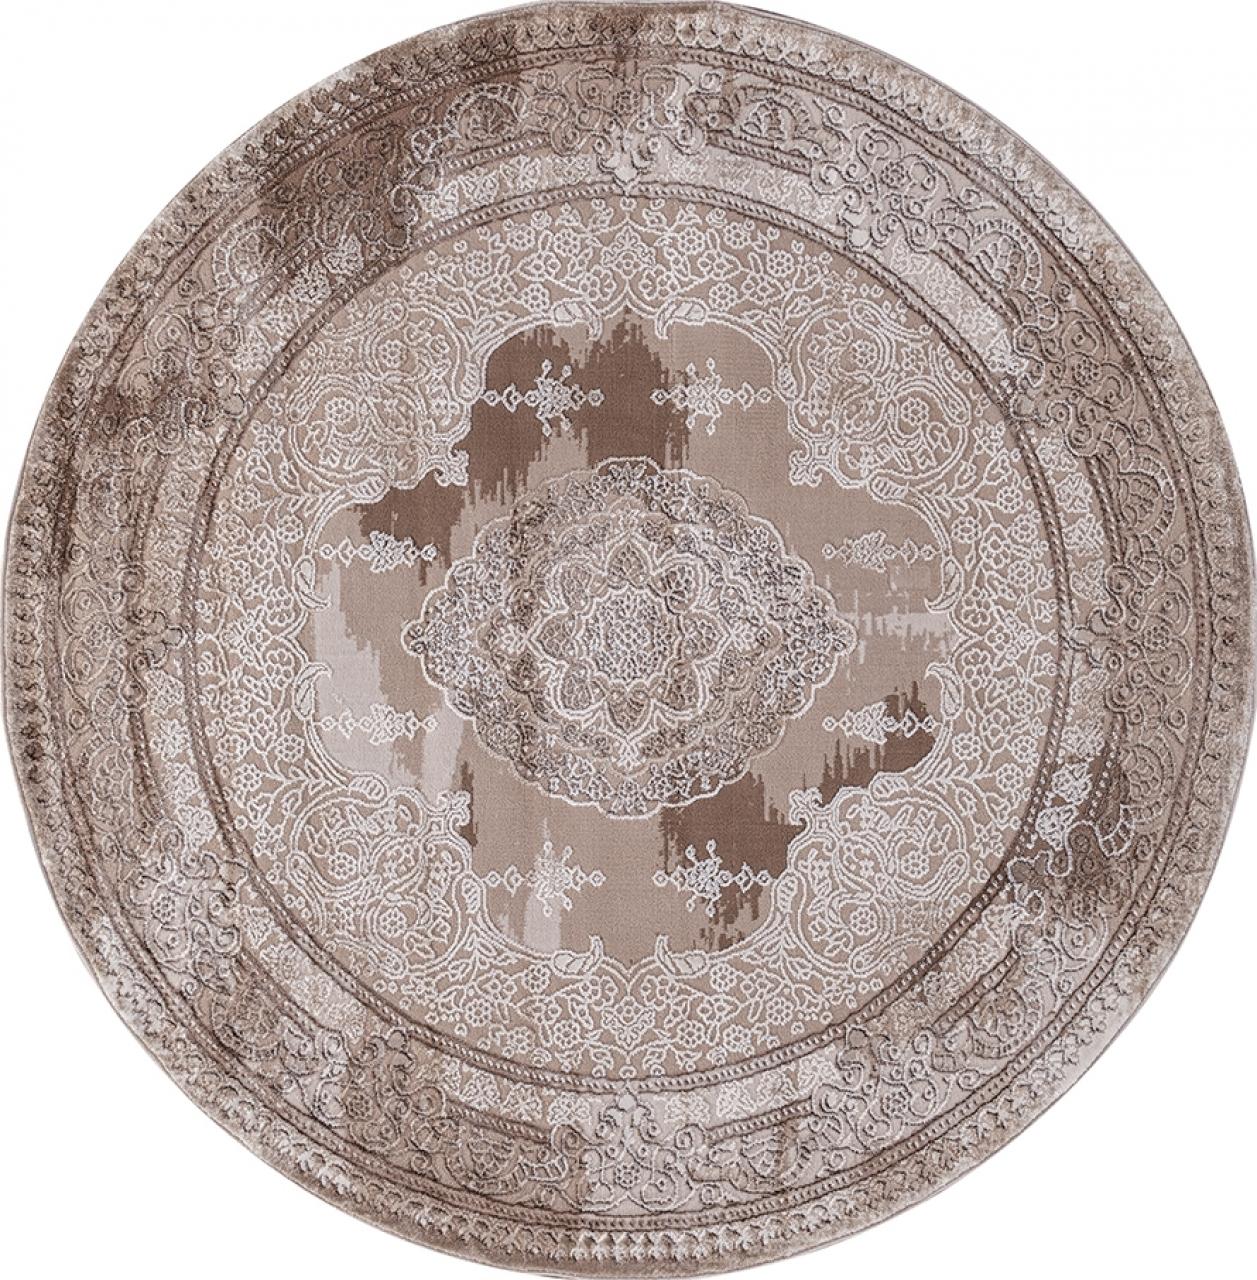 Ковер 03704A - BROWN / BROWN - Круг - коллекция ARMINA - фото 2